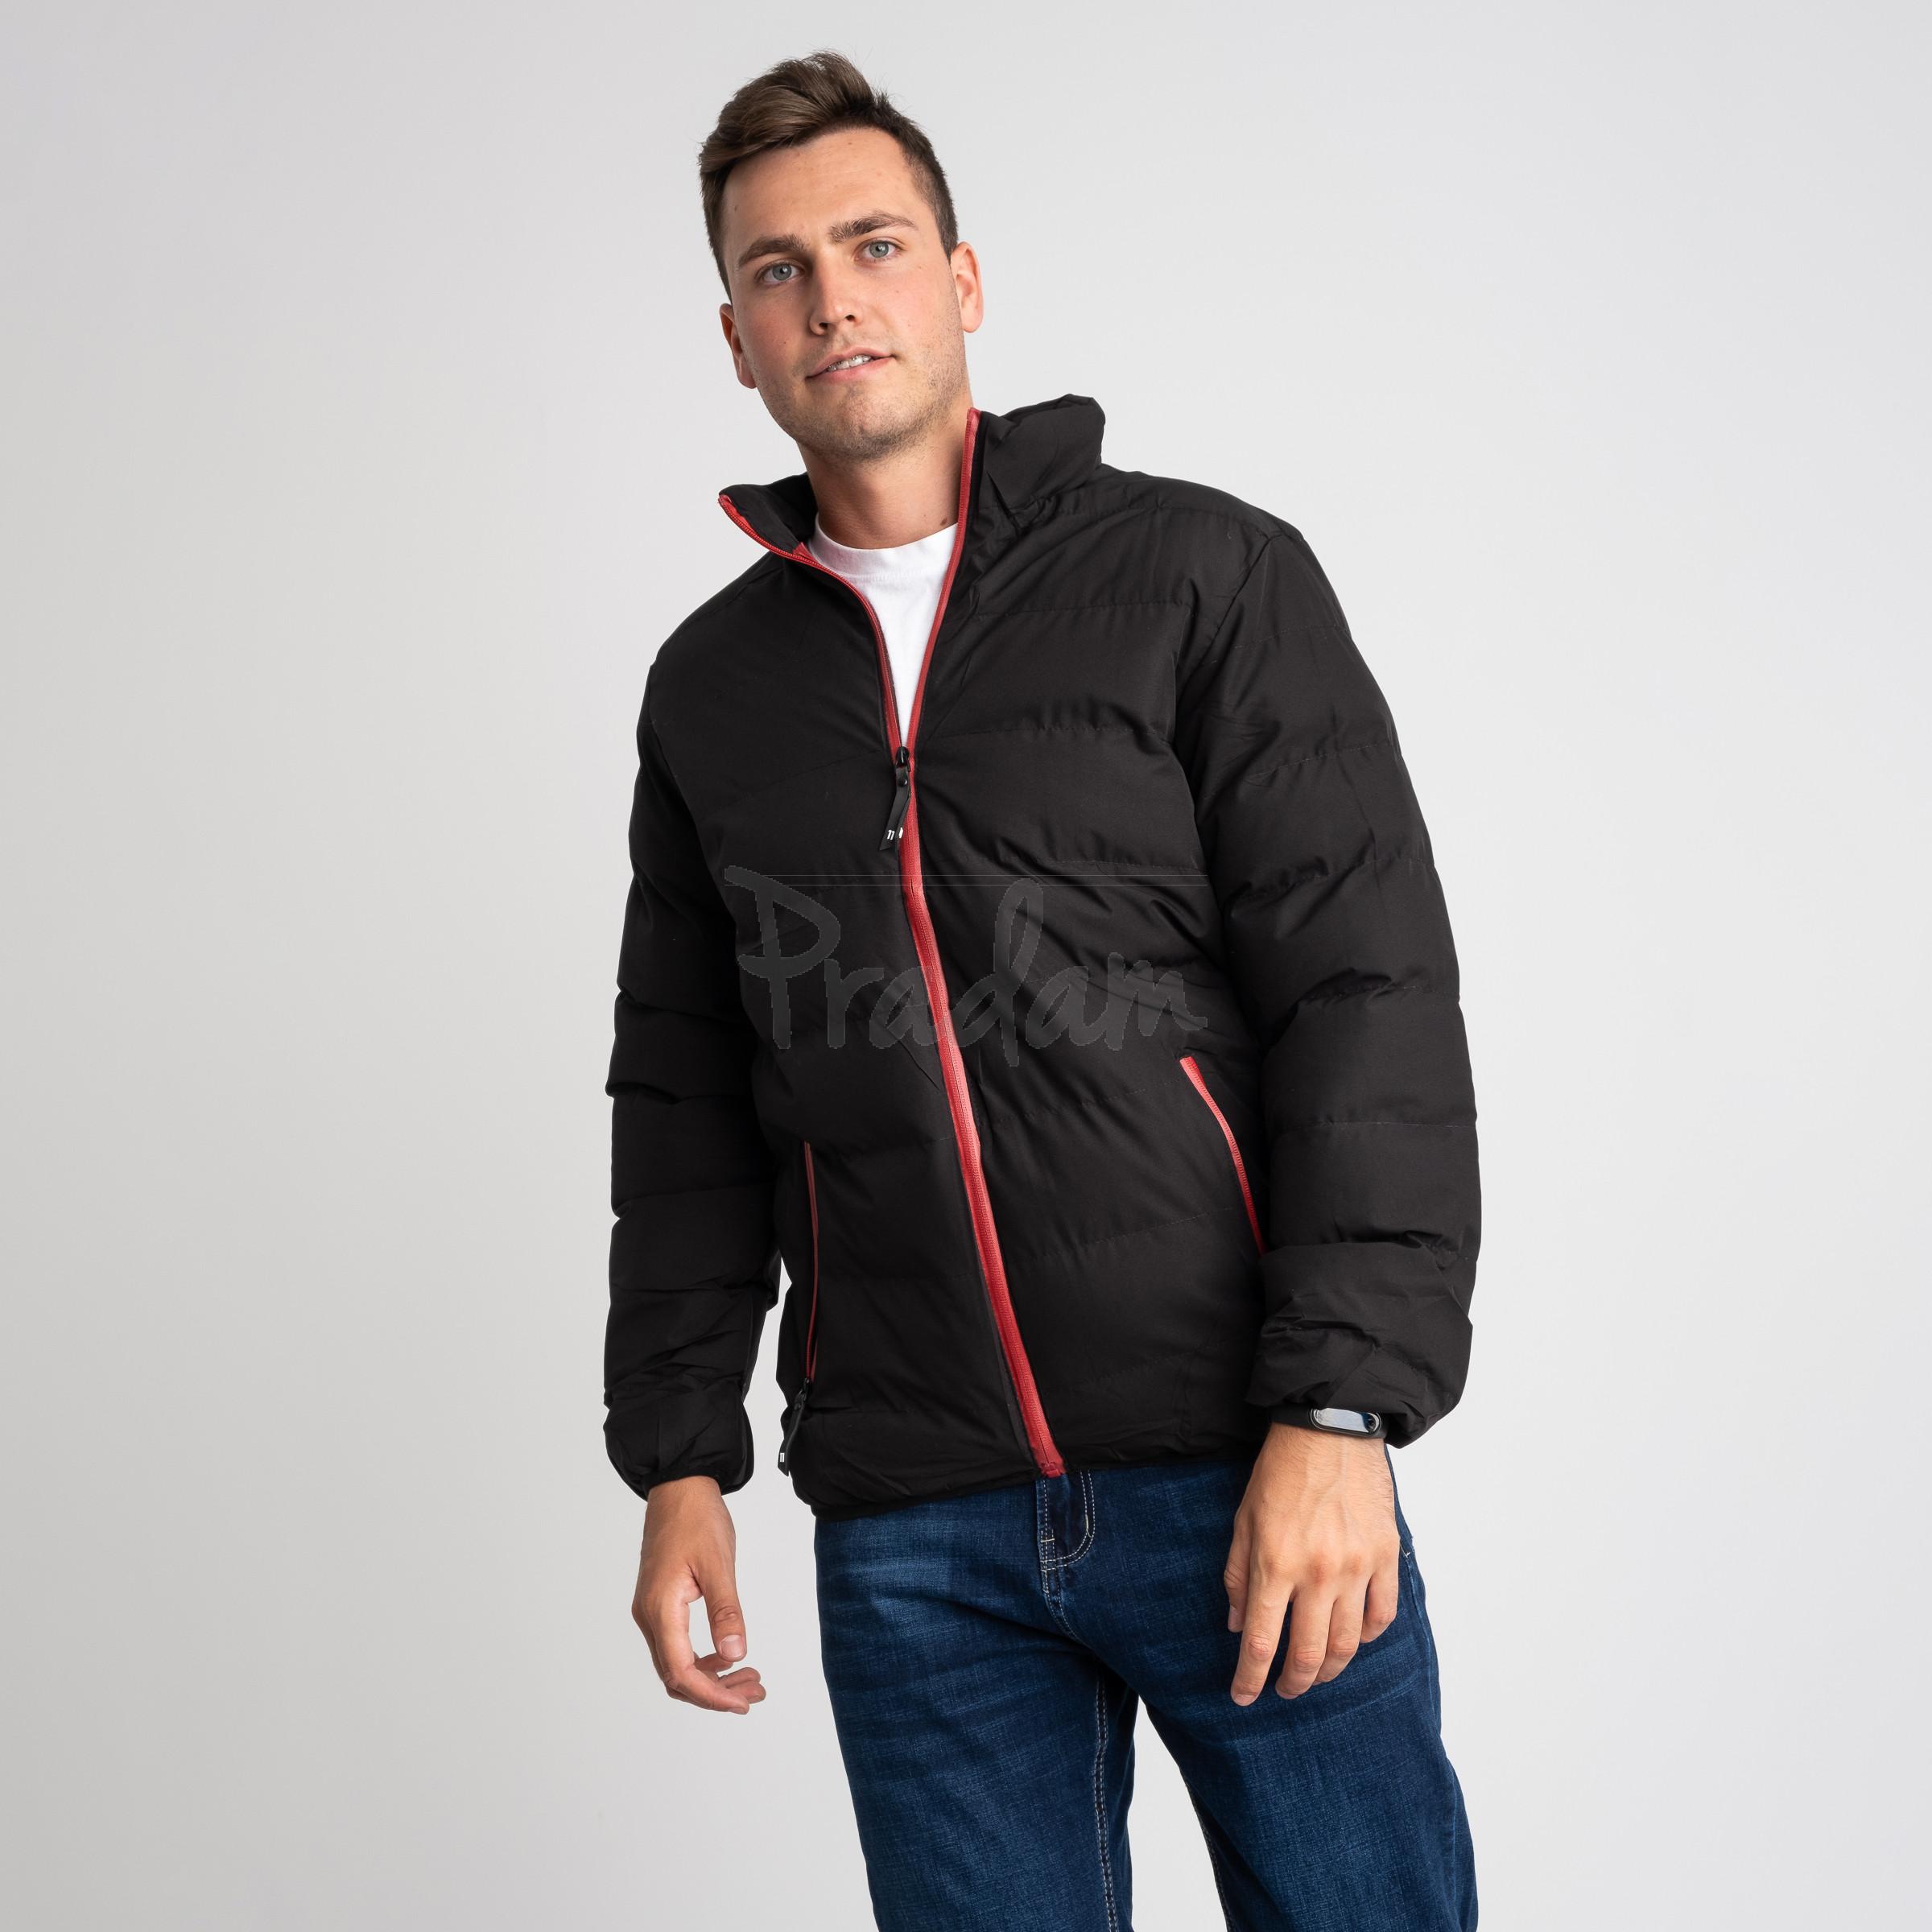 8088-1 черная куртка полубатальная мужская на синтепоне (6 ед .размеры : L-5XL)